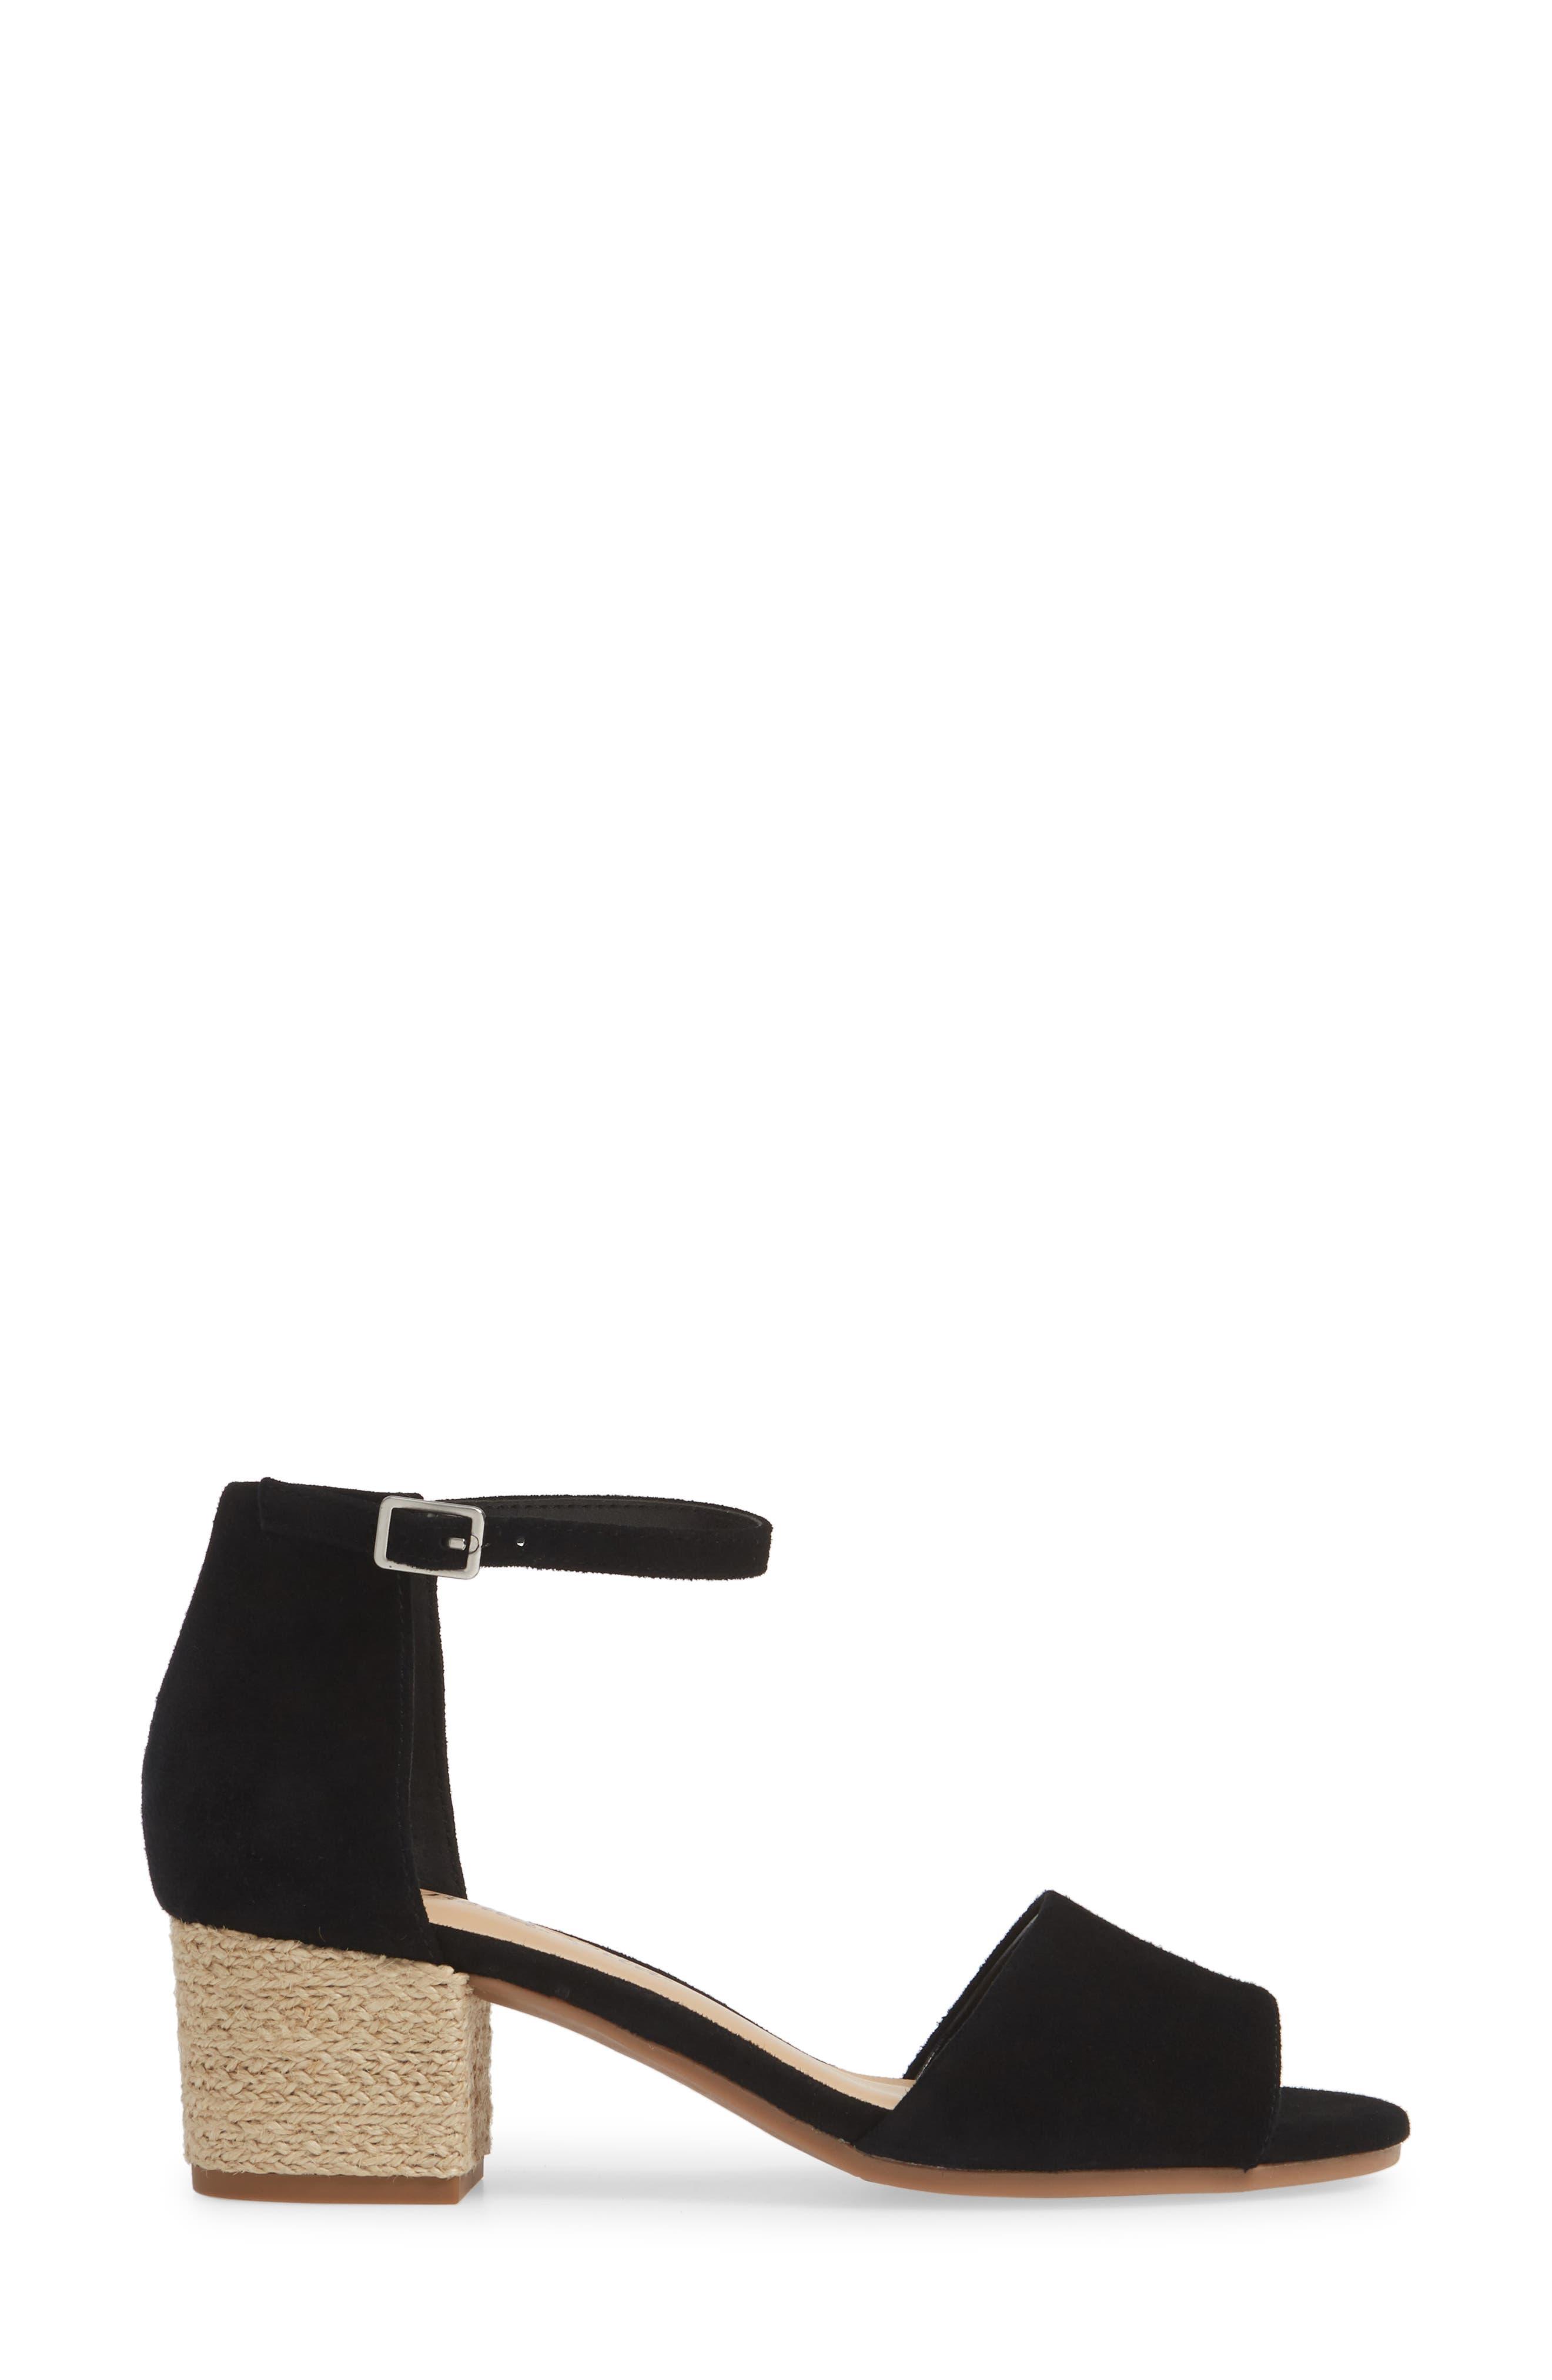 BELLA VITA, Fable Sandal, Alternate thumbnail 3, color, BLACK SUEDE